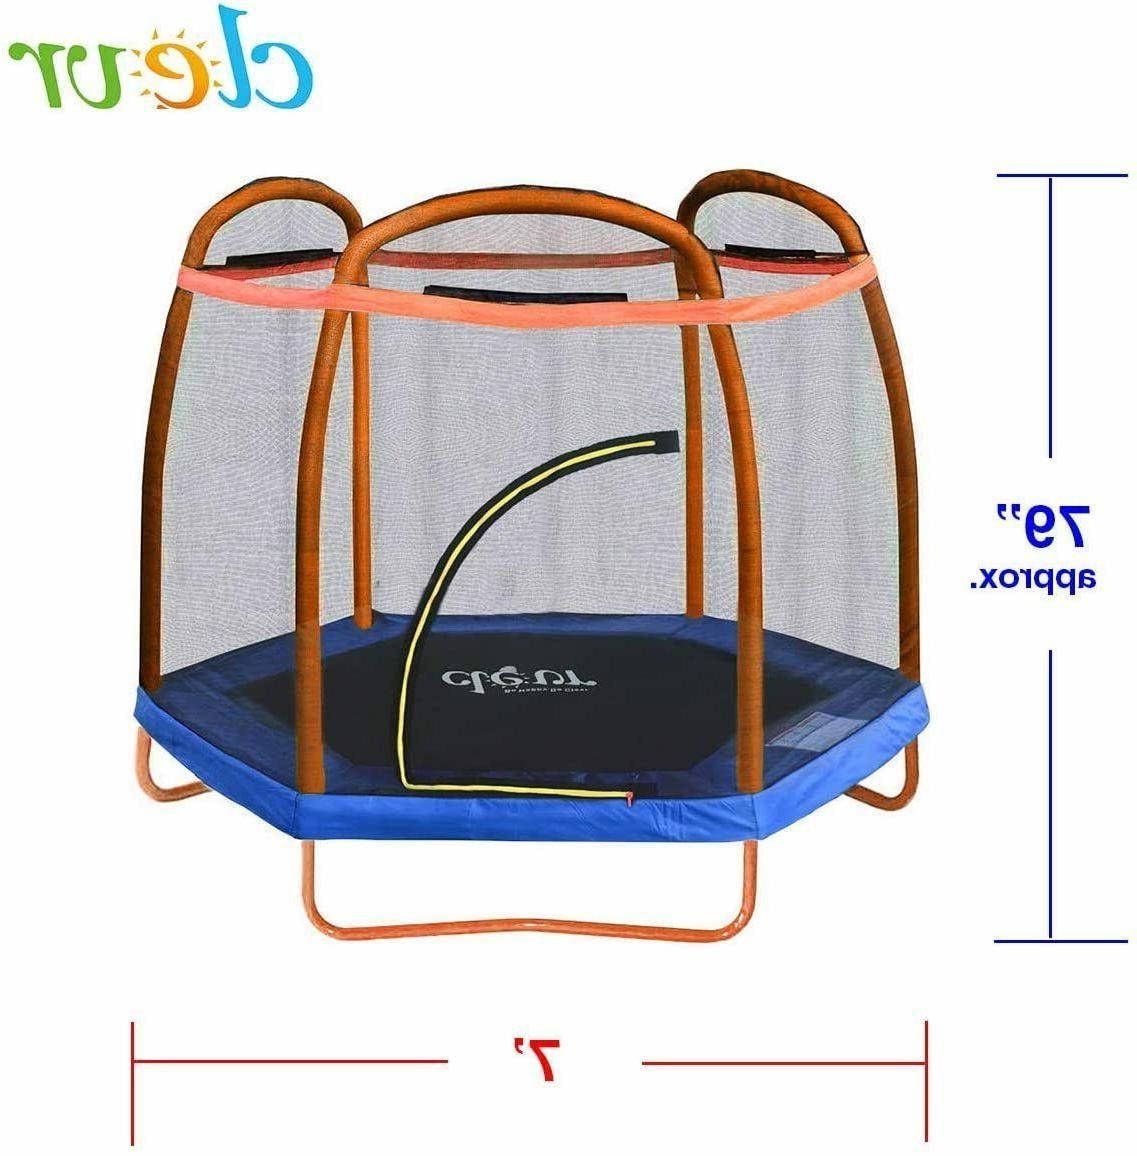 Trampoline Net Foot Activity Free